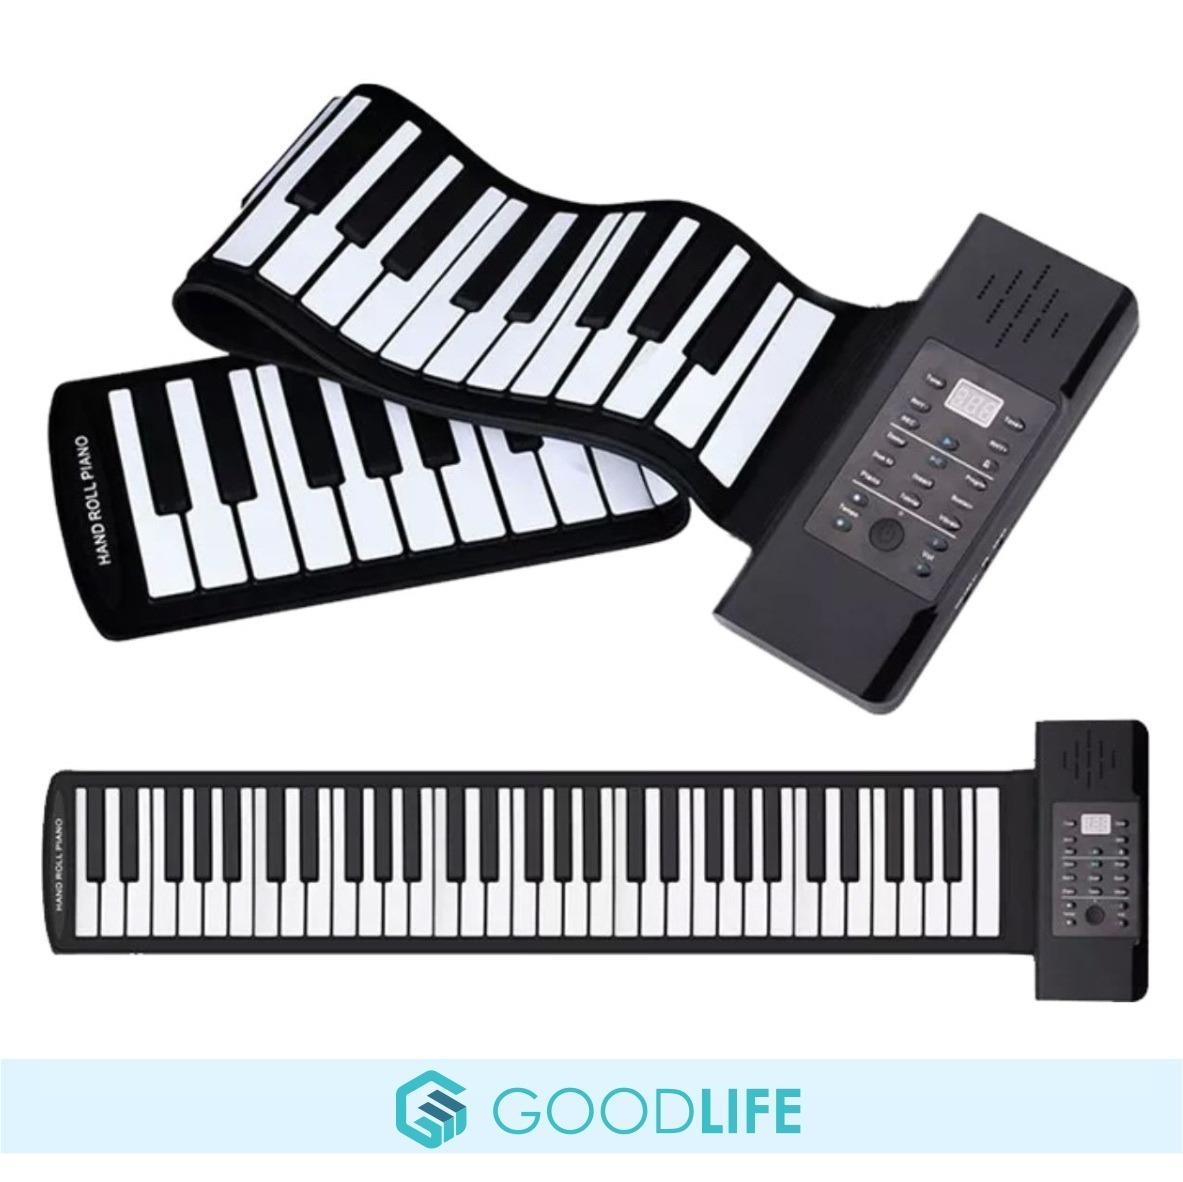 Teclado Organo Enrollable 61 Teclas Piano Flexible Usb Midi